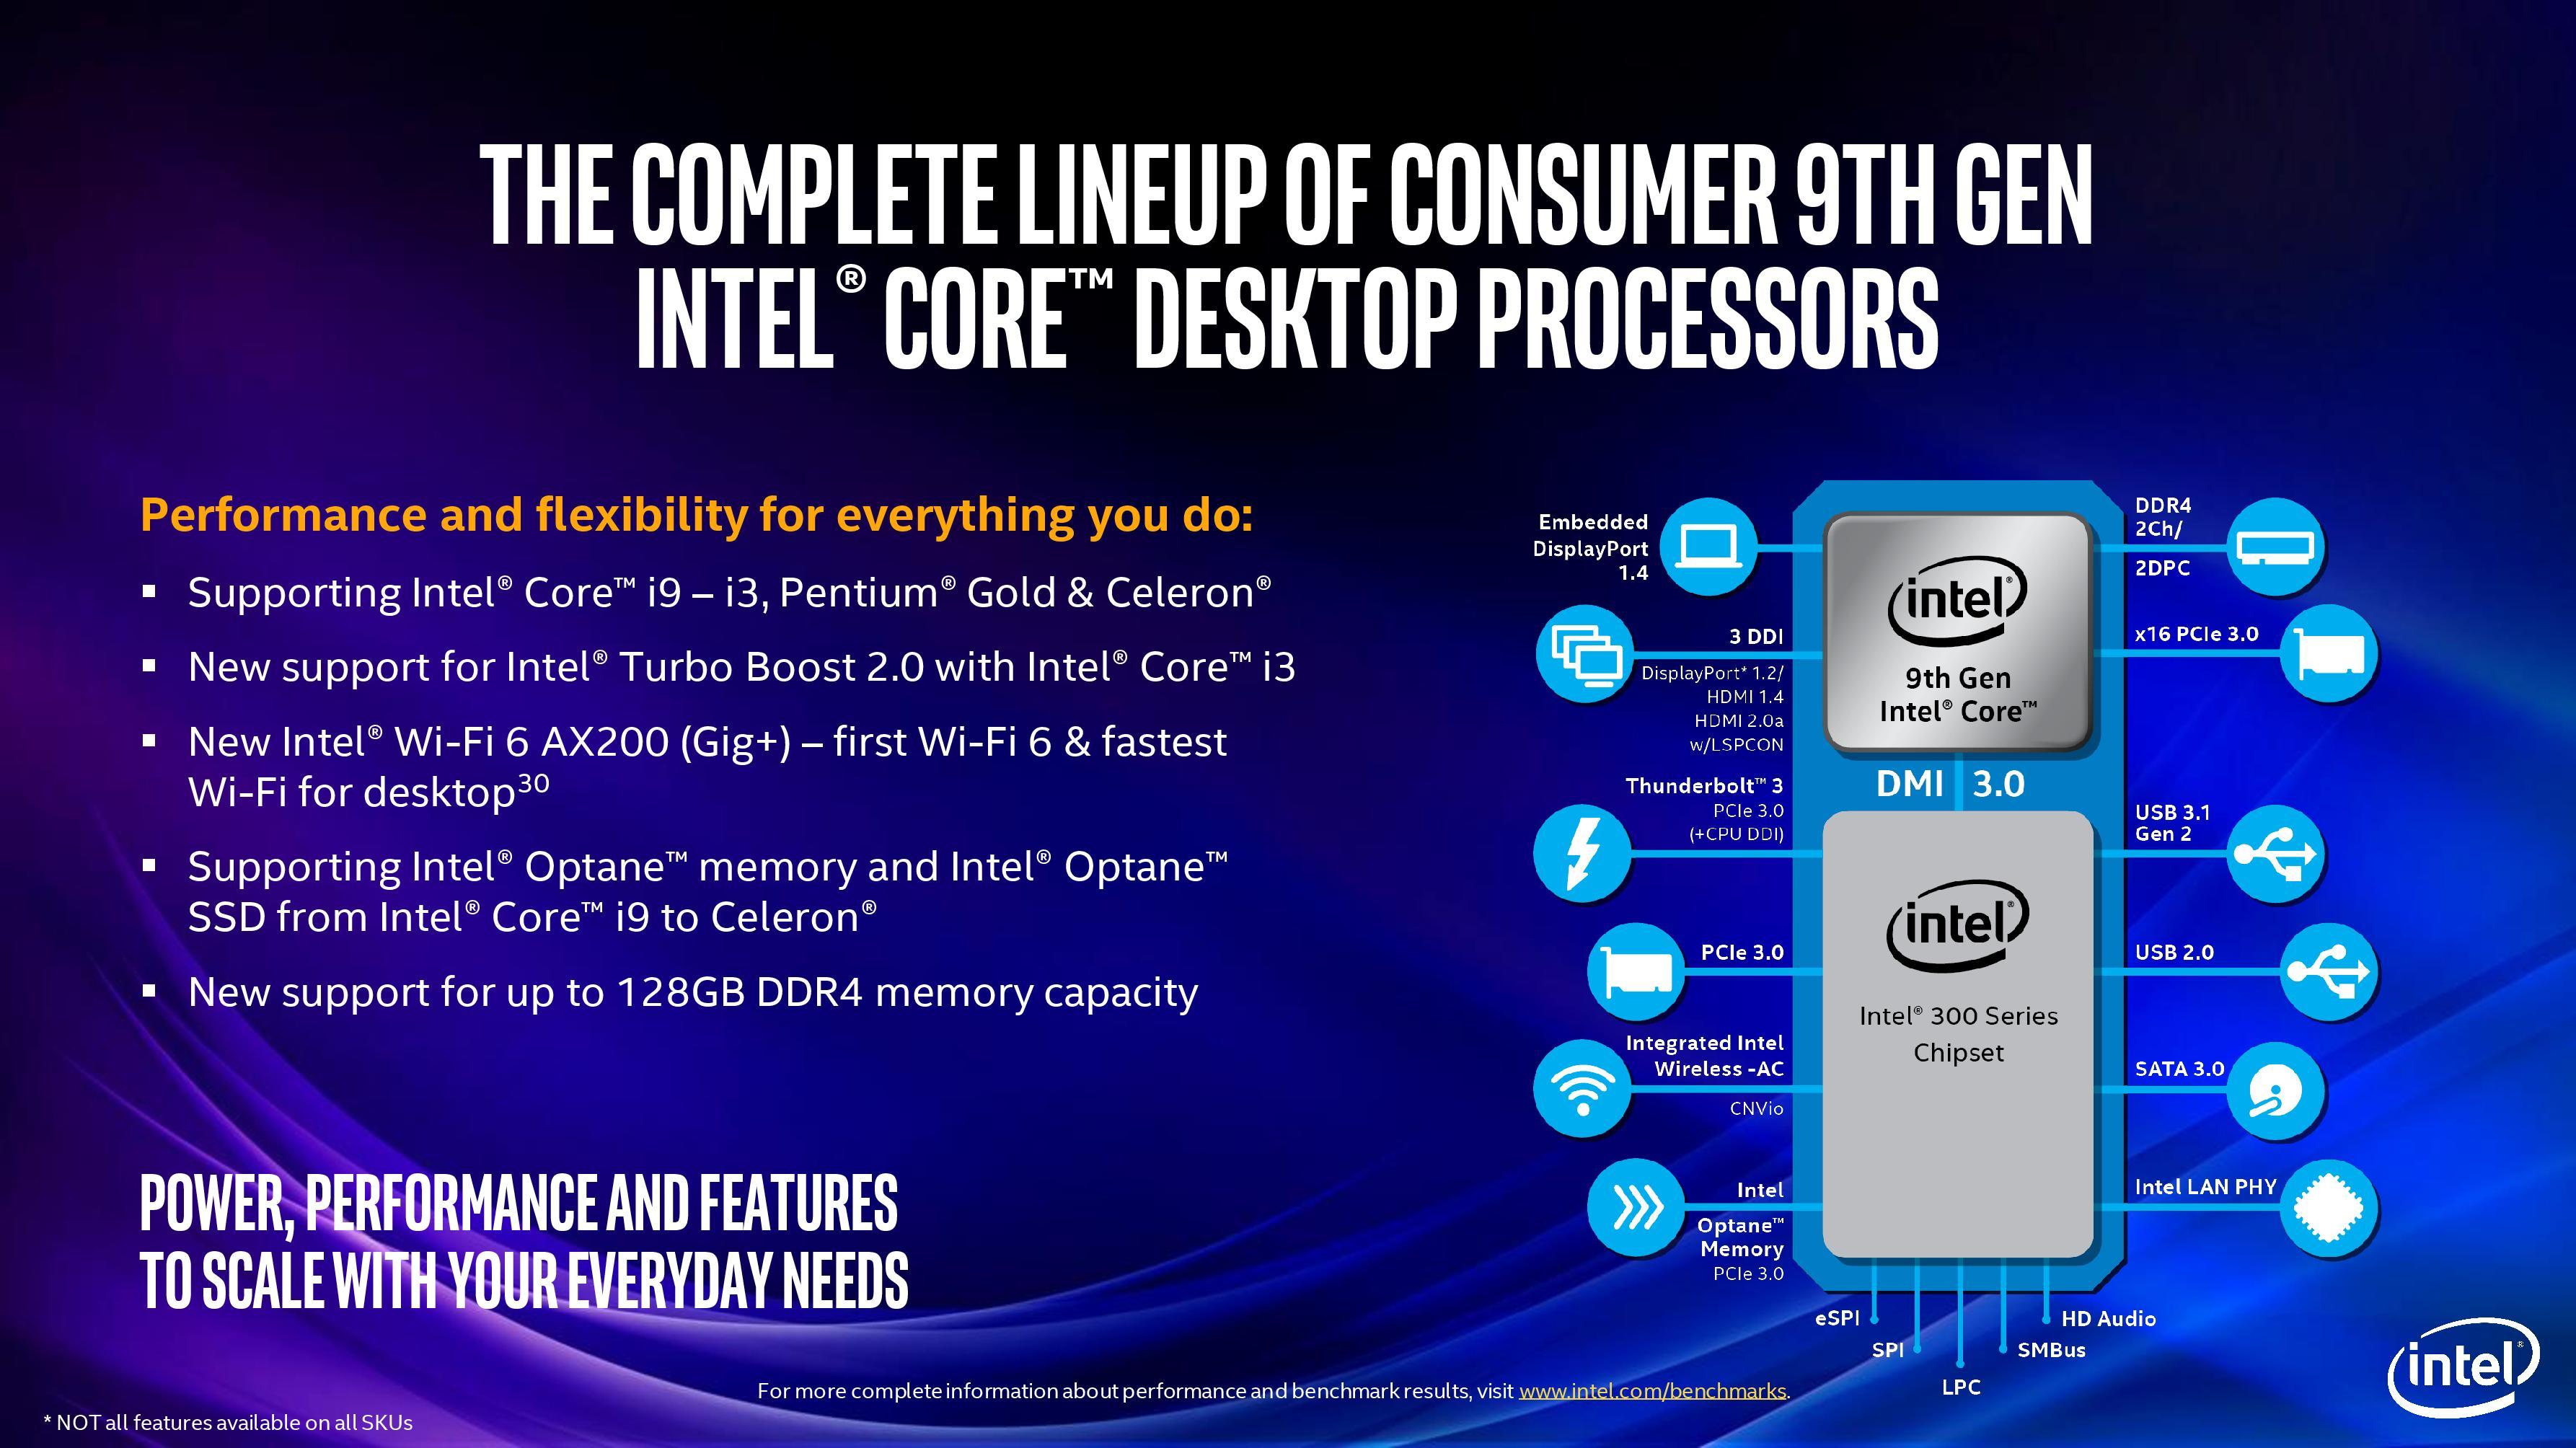 Intel 9th Gen Core Processors: All the Desktop and Mobile